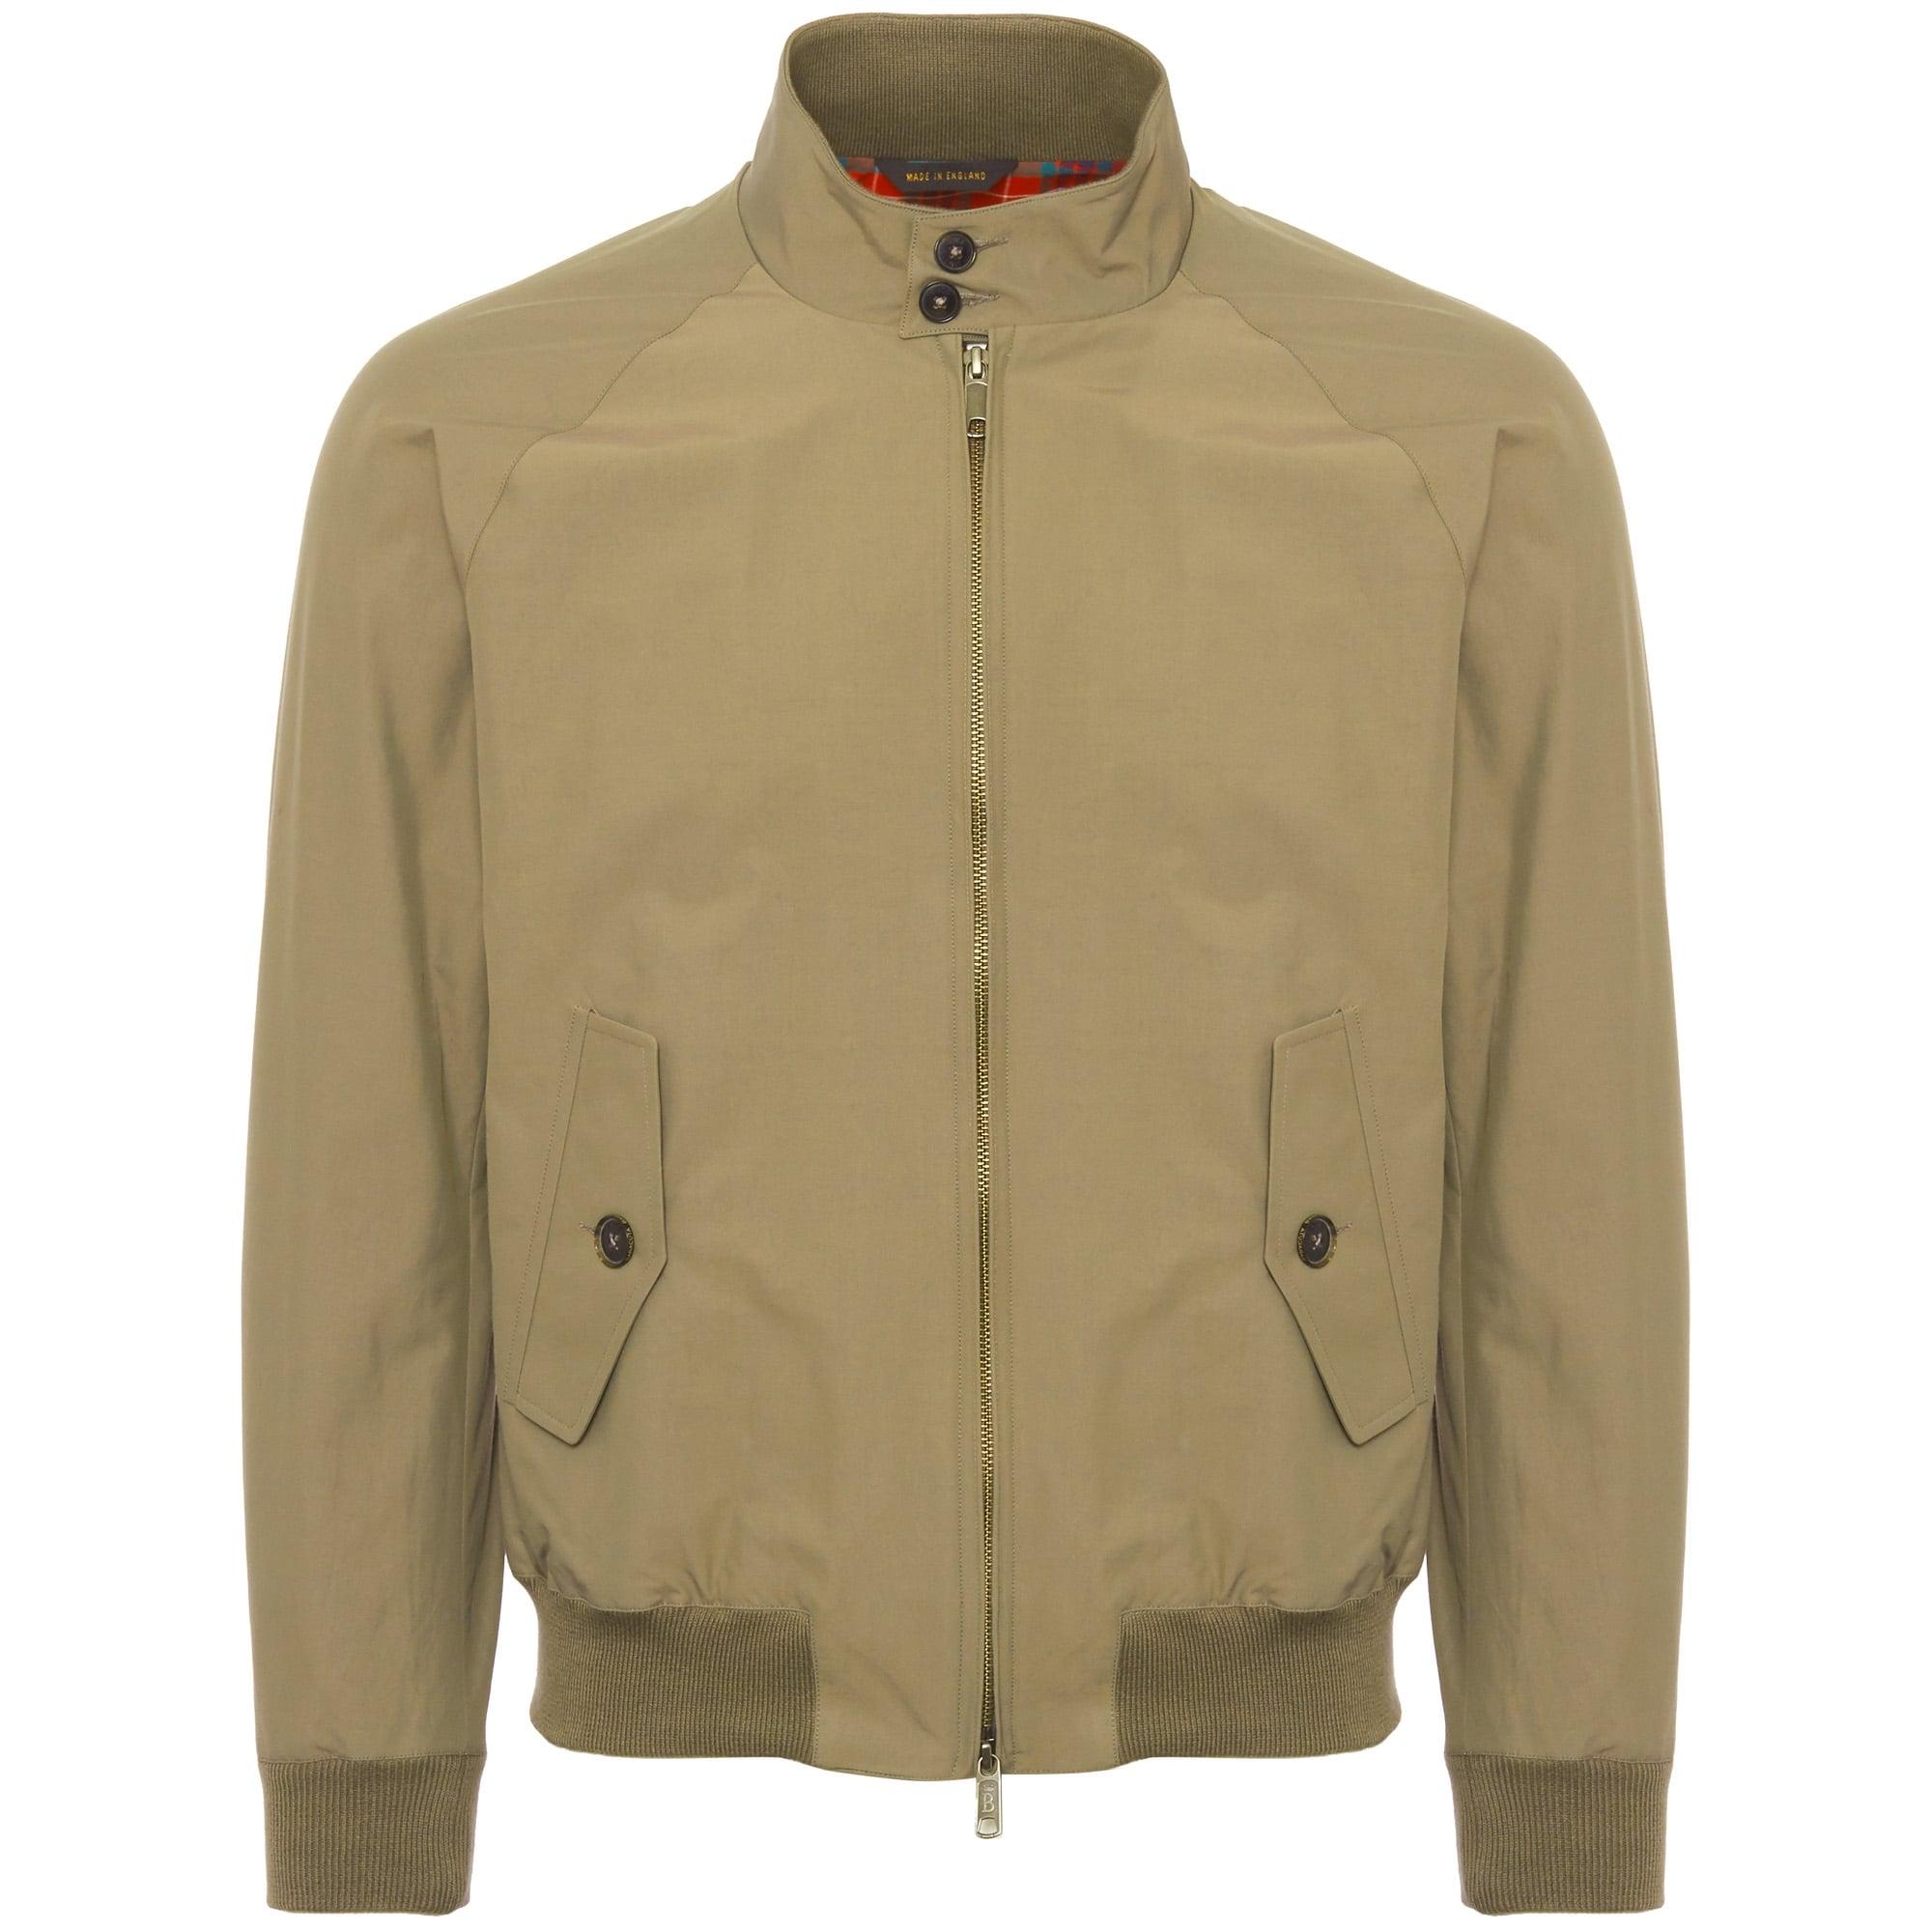 bf731d9ee88e1 Baracuta G9 Original Harrington Jacket Tan BRCPS0001